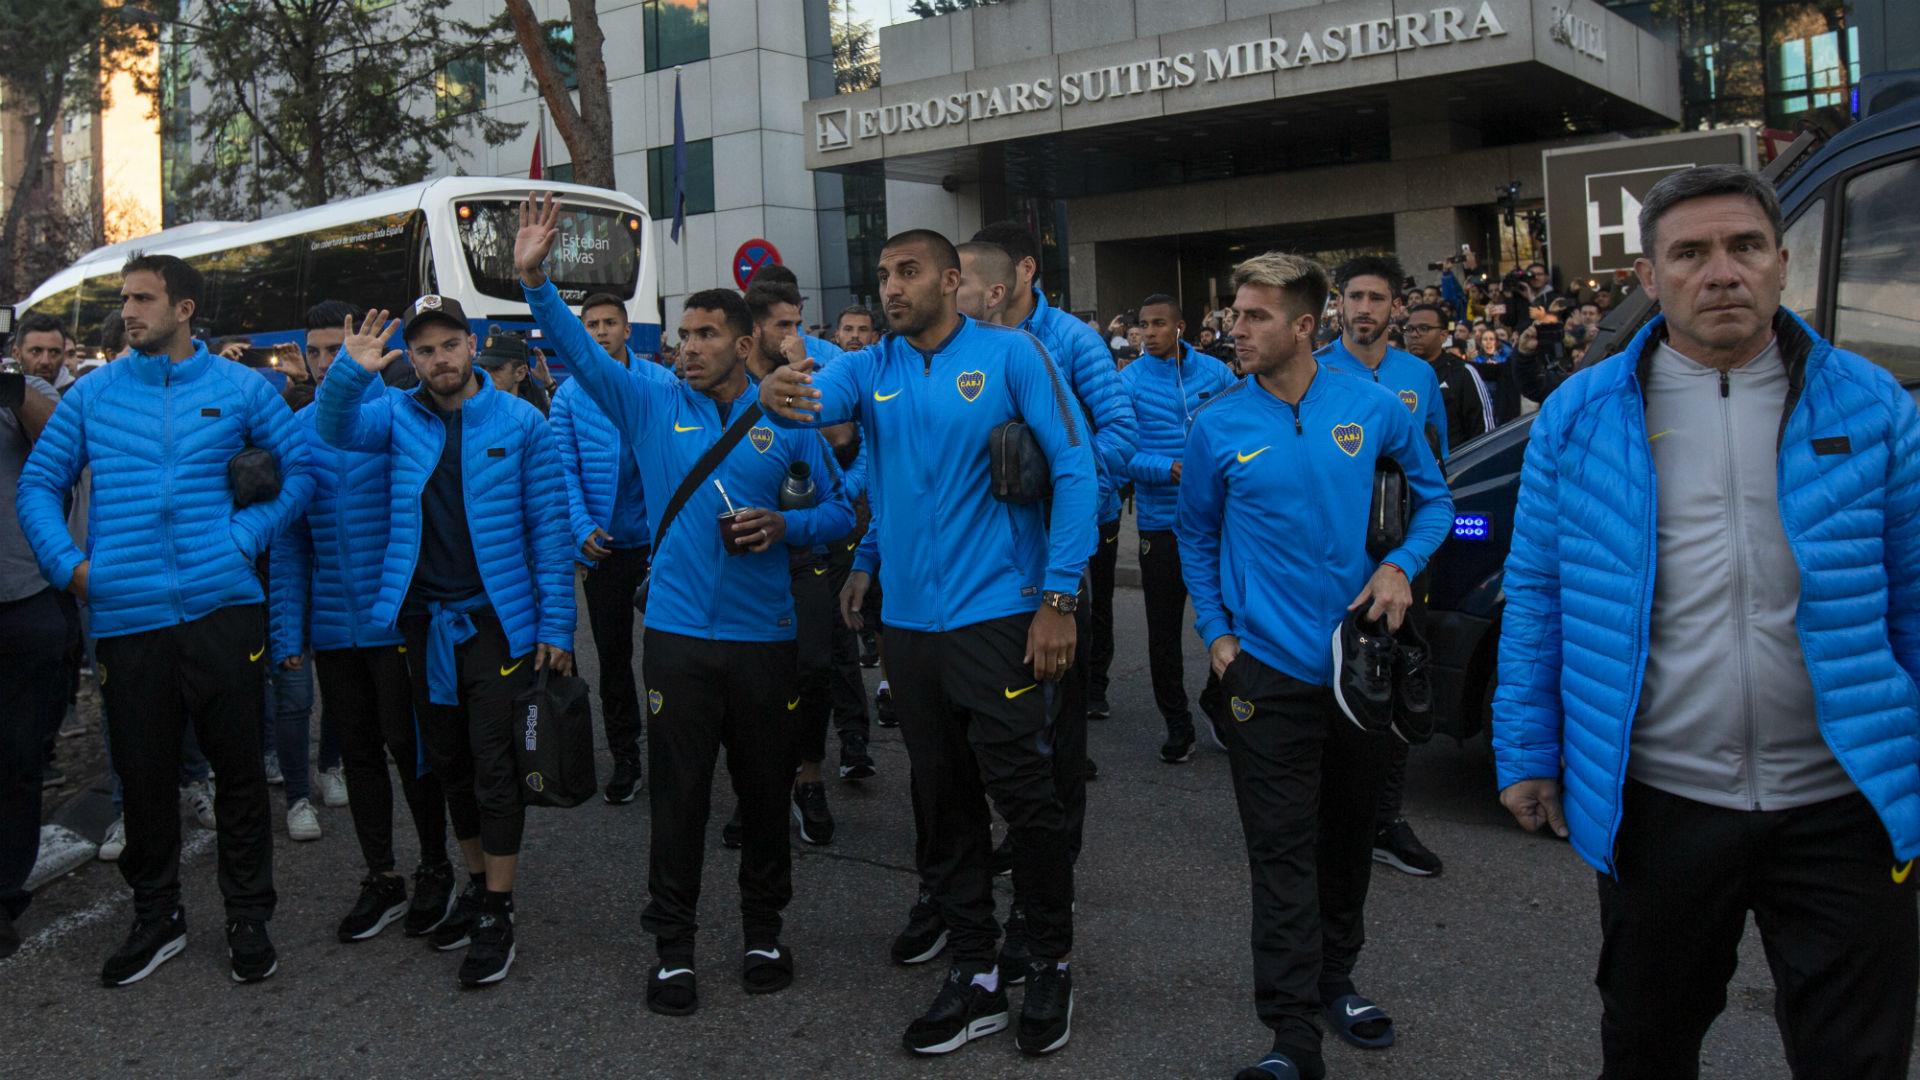 No plan to host future Libertadores finals in Europe, assures CONMEBOL president